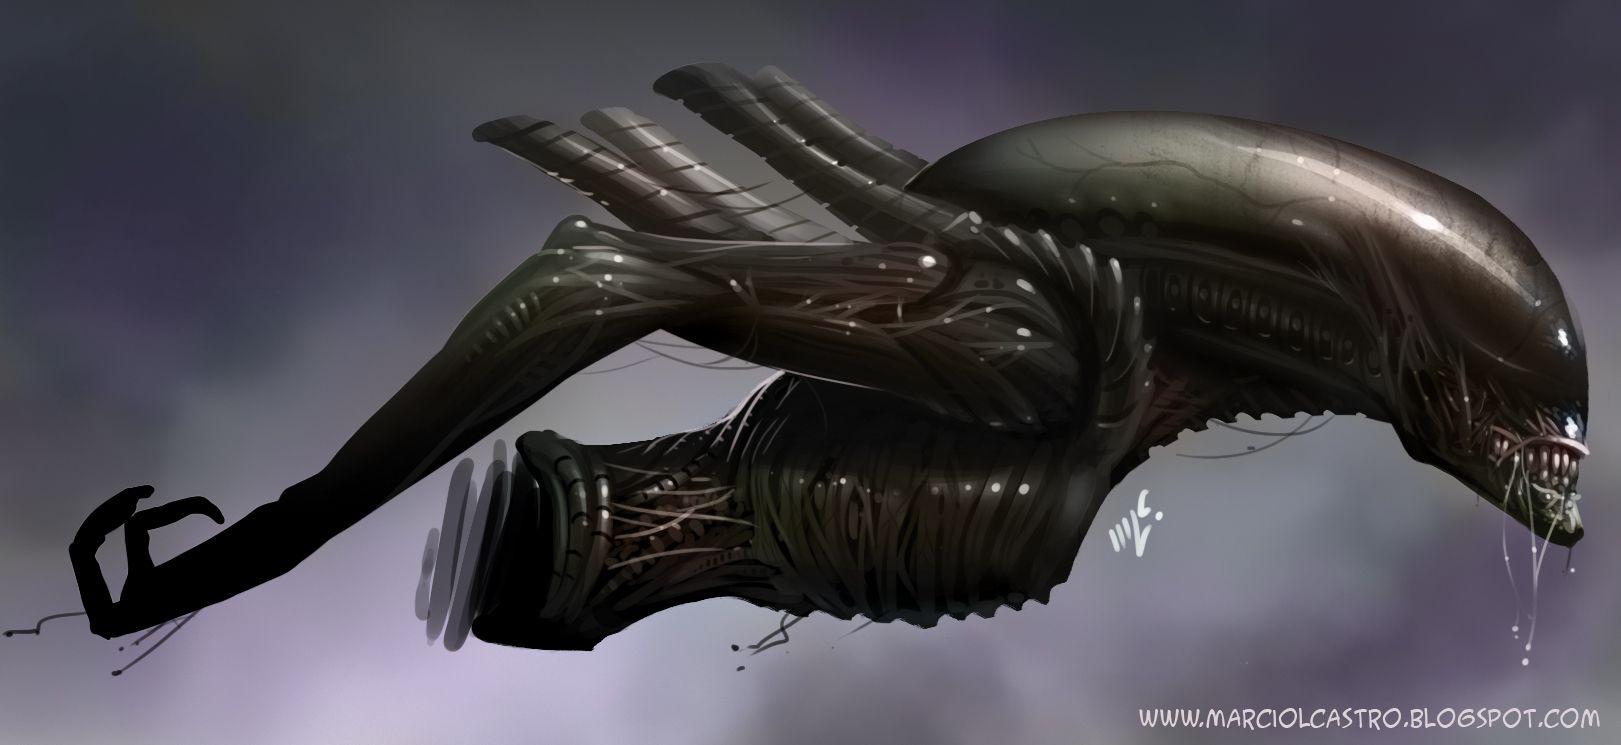 Aliens   Alien vs predator, Aliens movie, Predator alien